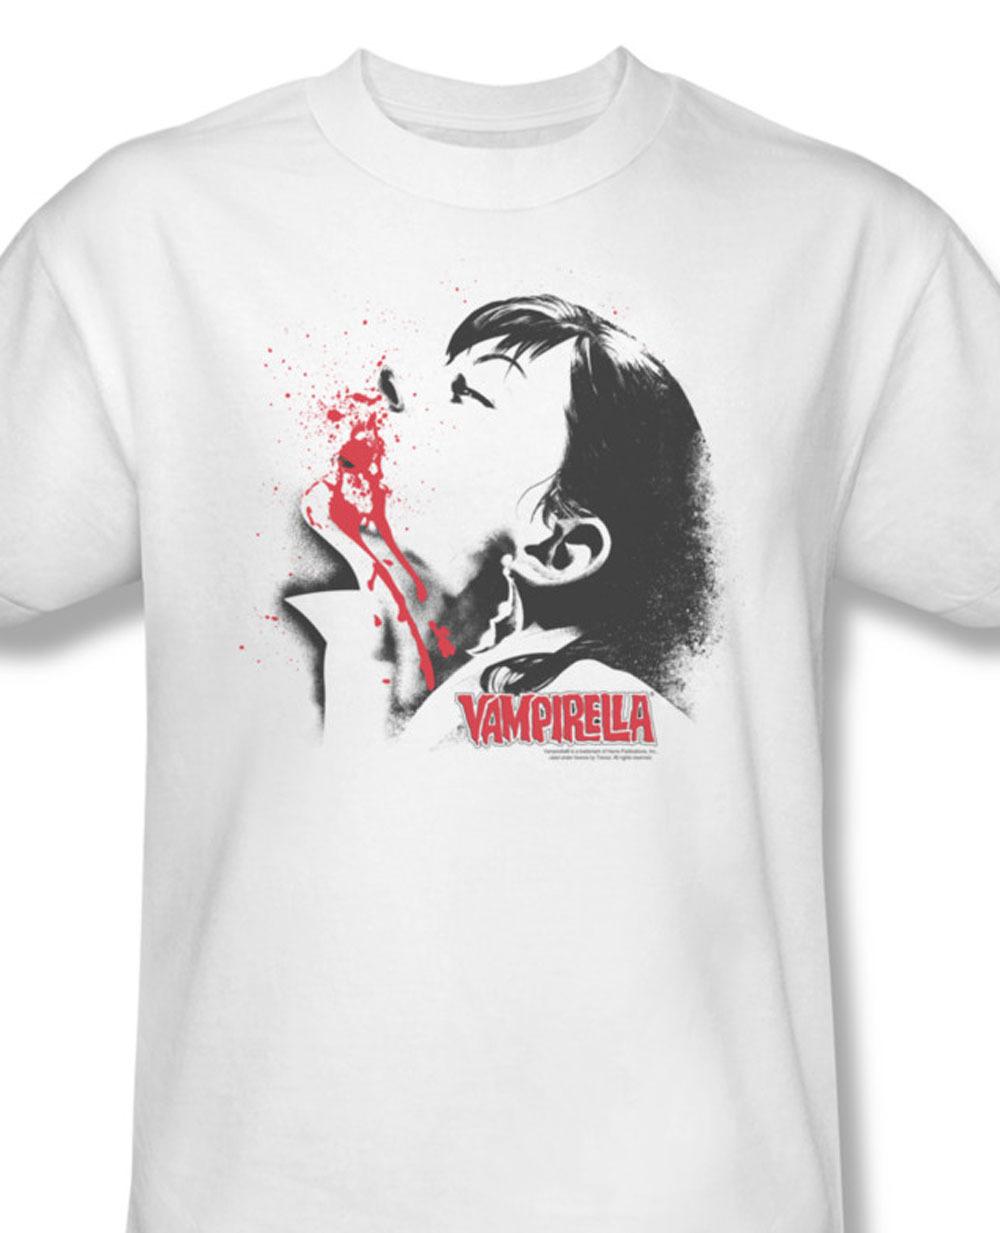 at vampirella elvira gothic pin up girls comic book horror for sale online white graphic tshirt